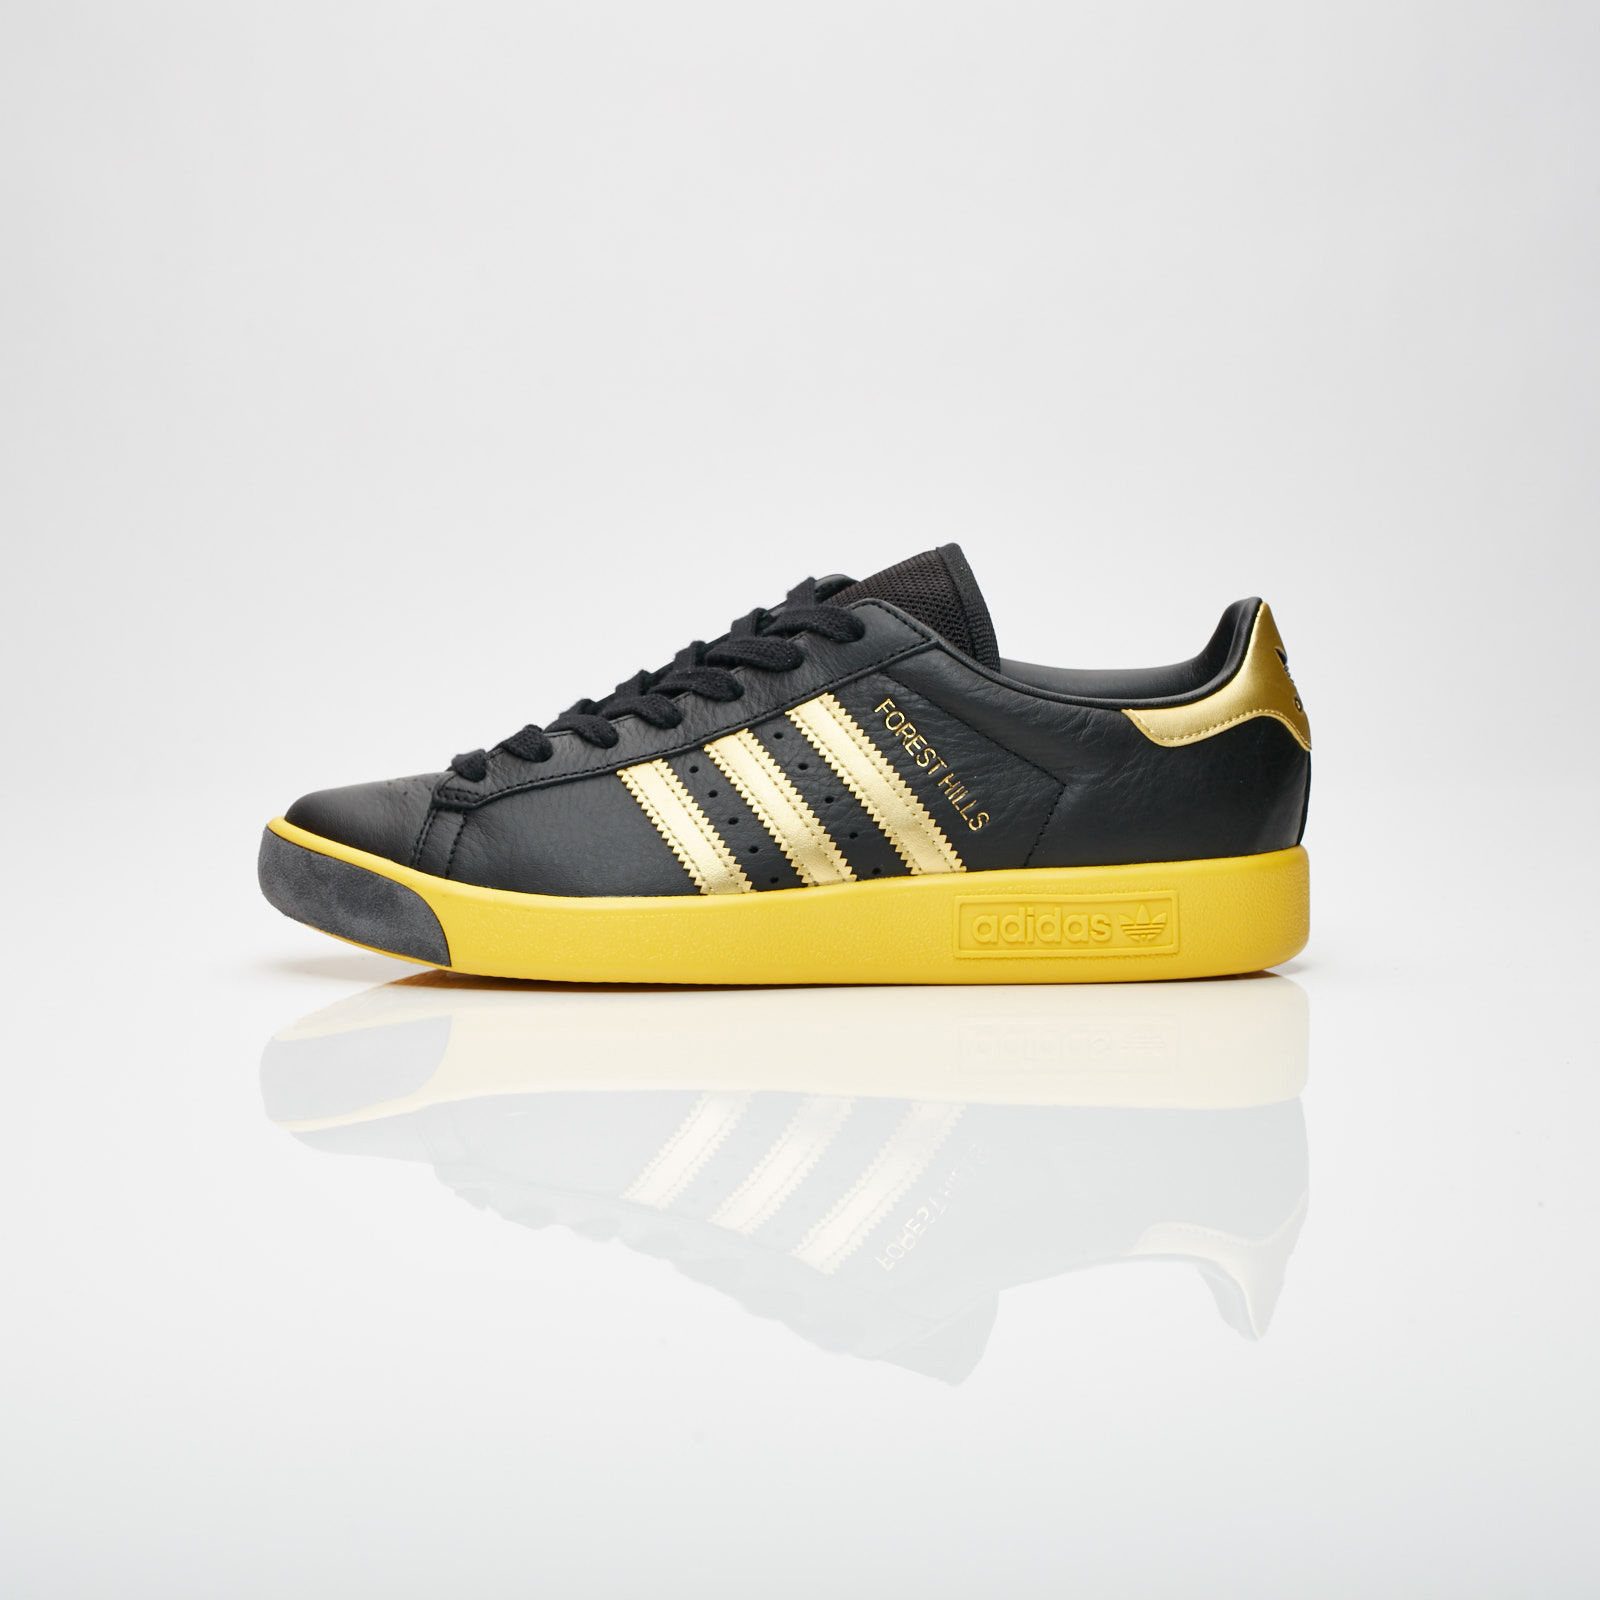 adidas Forest Hills - Cq2084